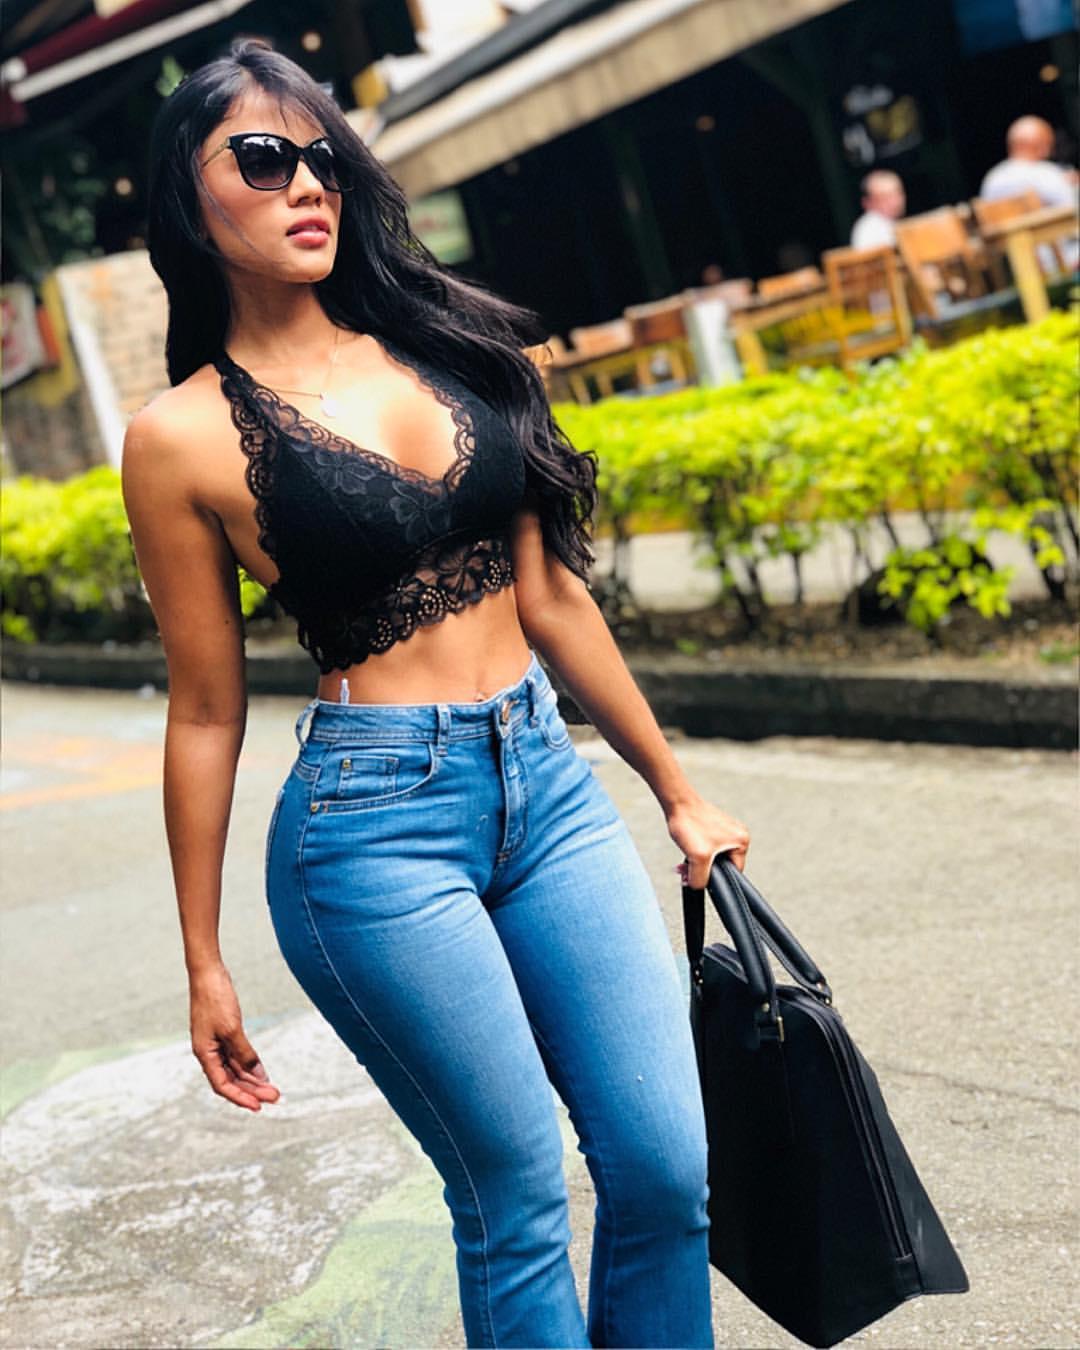 Karina colombia Elda Neyis